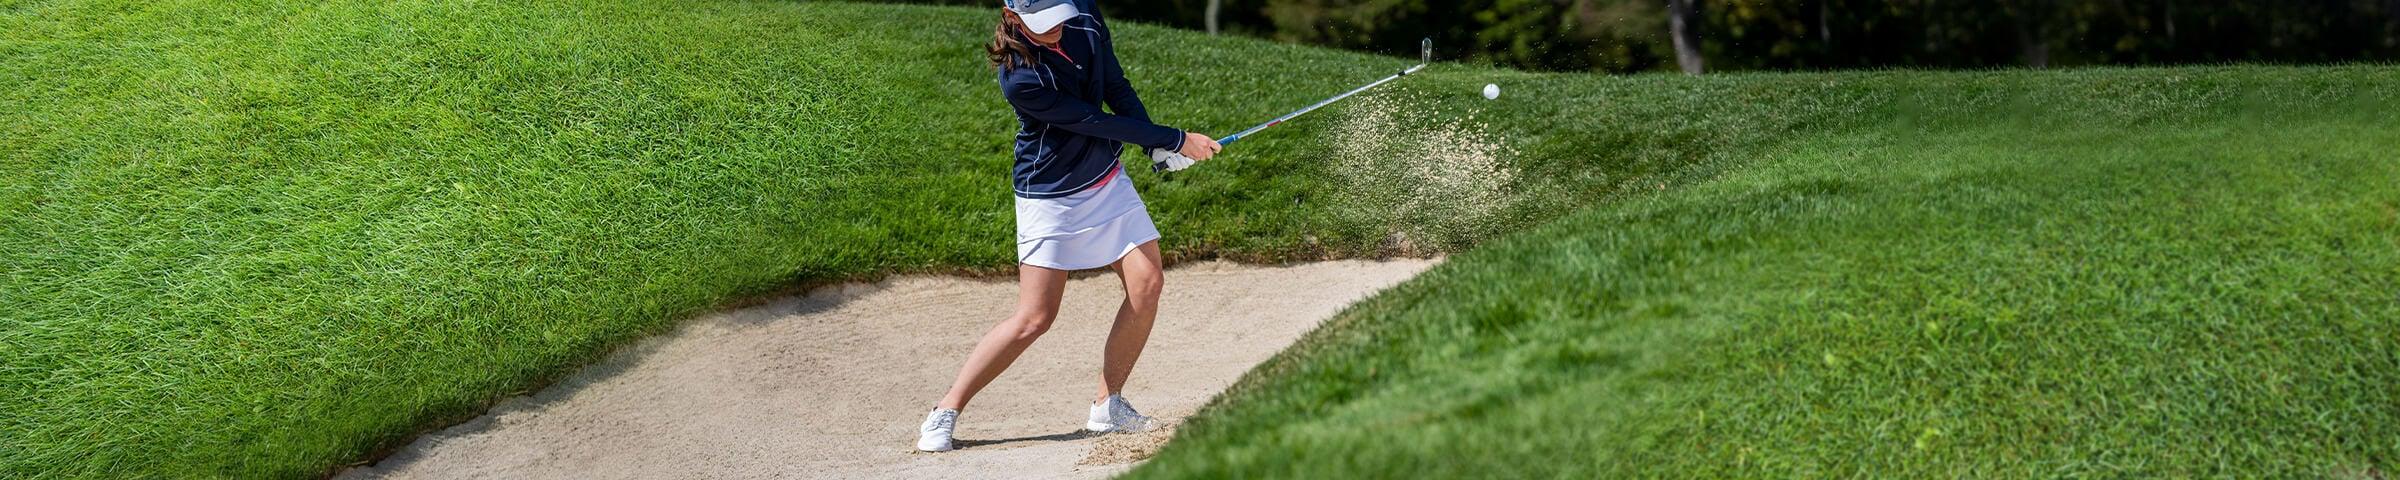 FootJoy Women's Golf Apparel - Bottoms